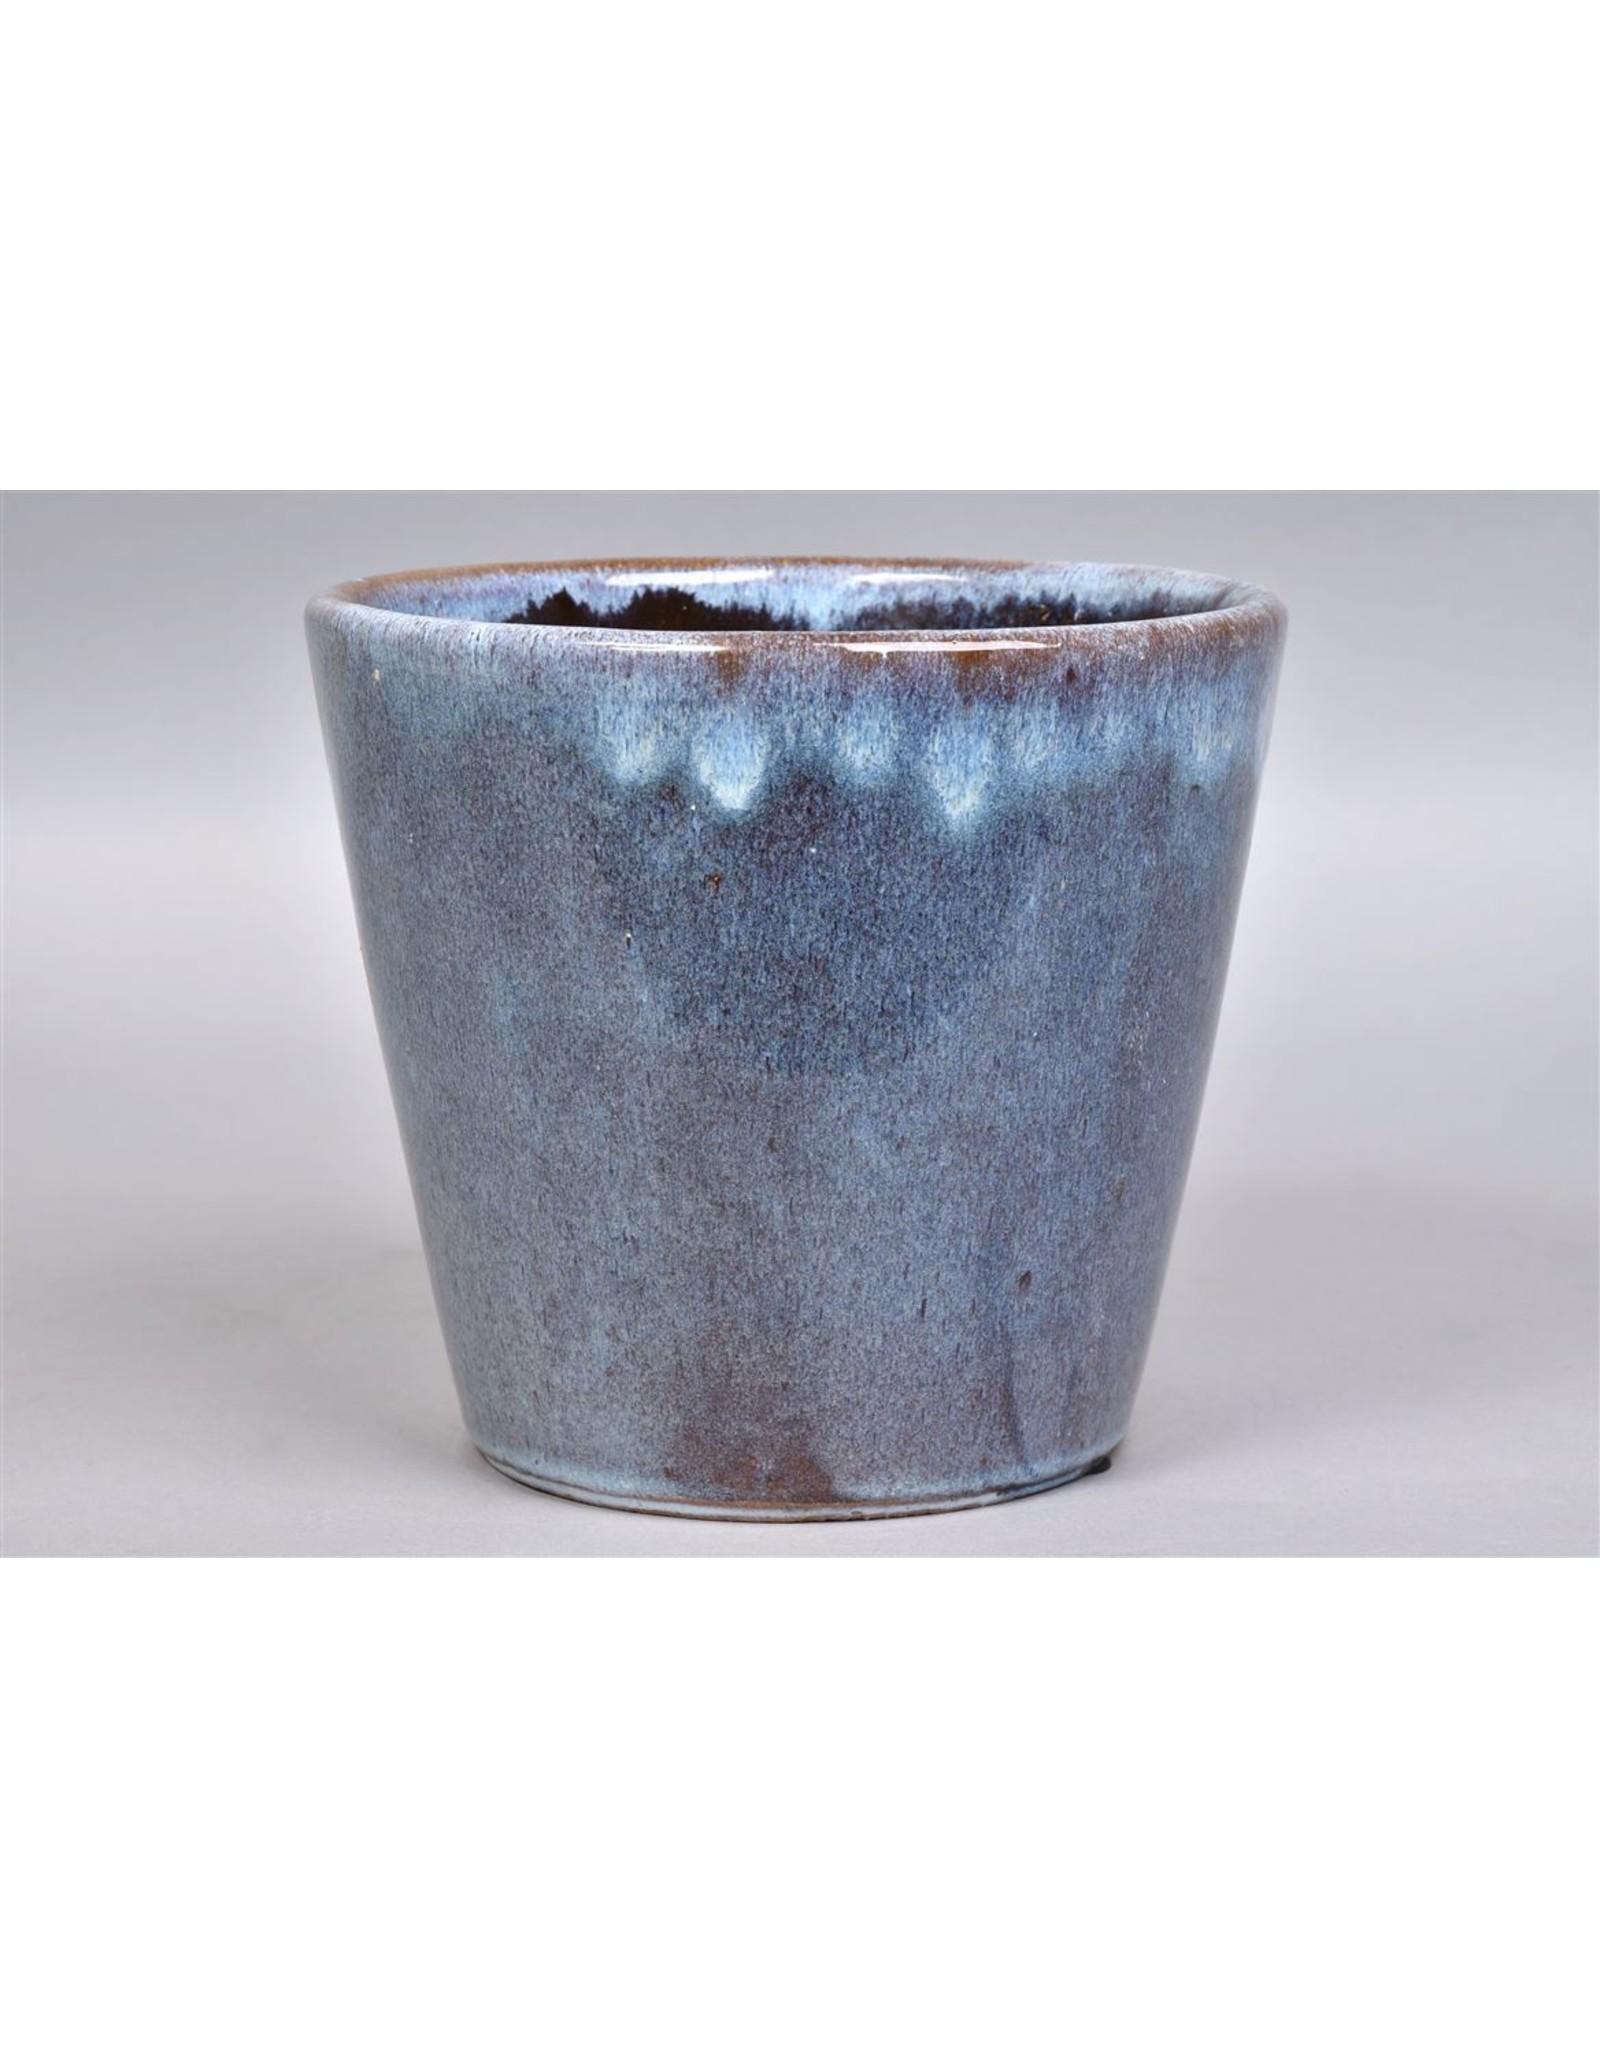 DK Alicante Lichtblauw Pot 20x18cm x 2